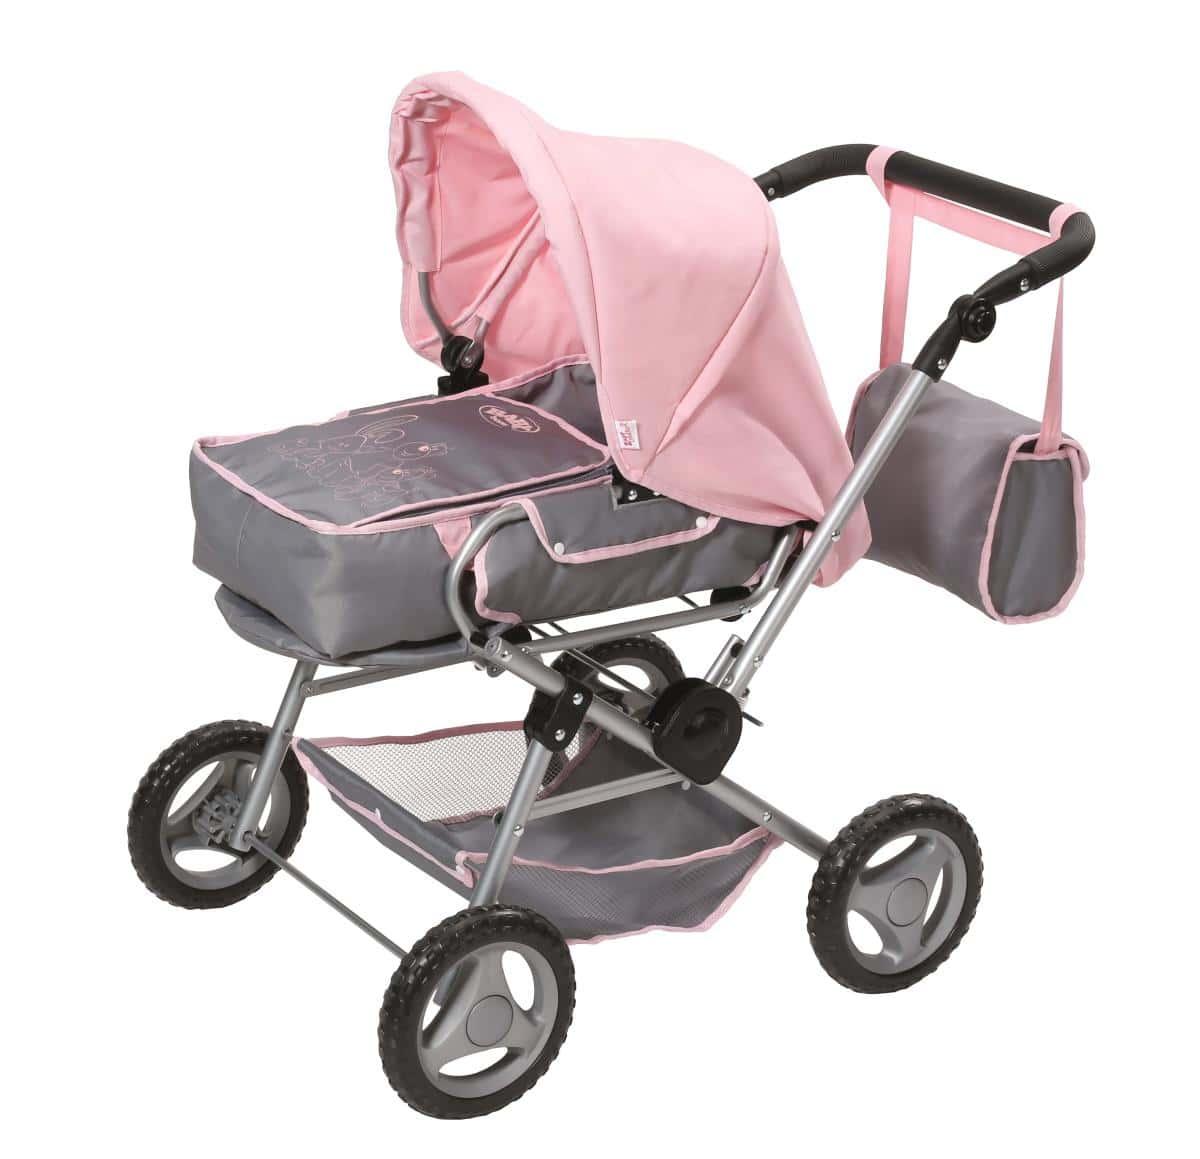 baby born puppenwagen deluxe zapf g nstig online kaufen. Black Bedroom Furniture Sets. Home Design Ideas